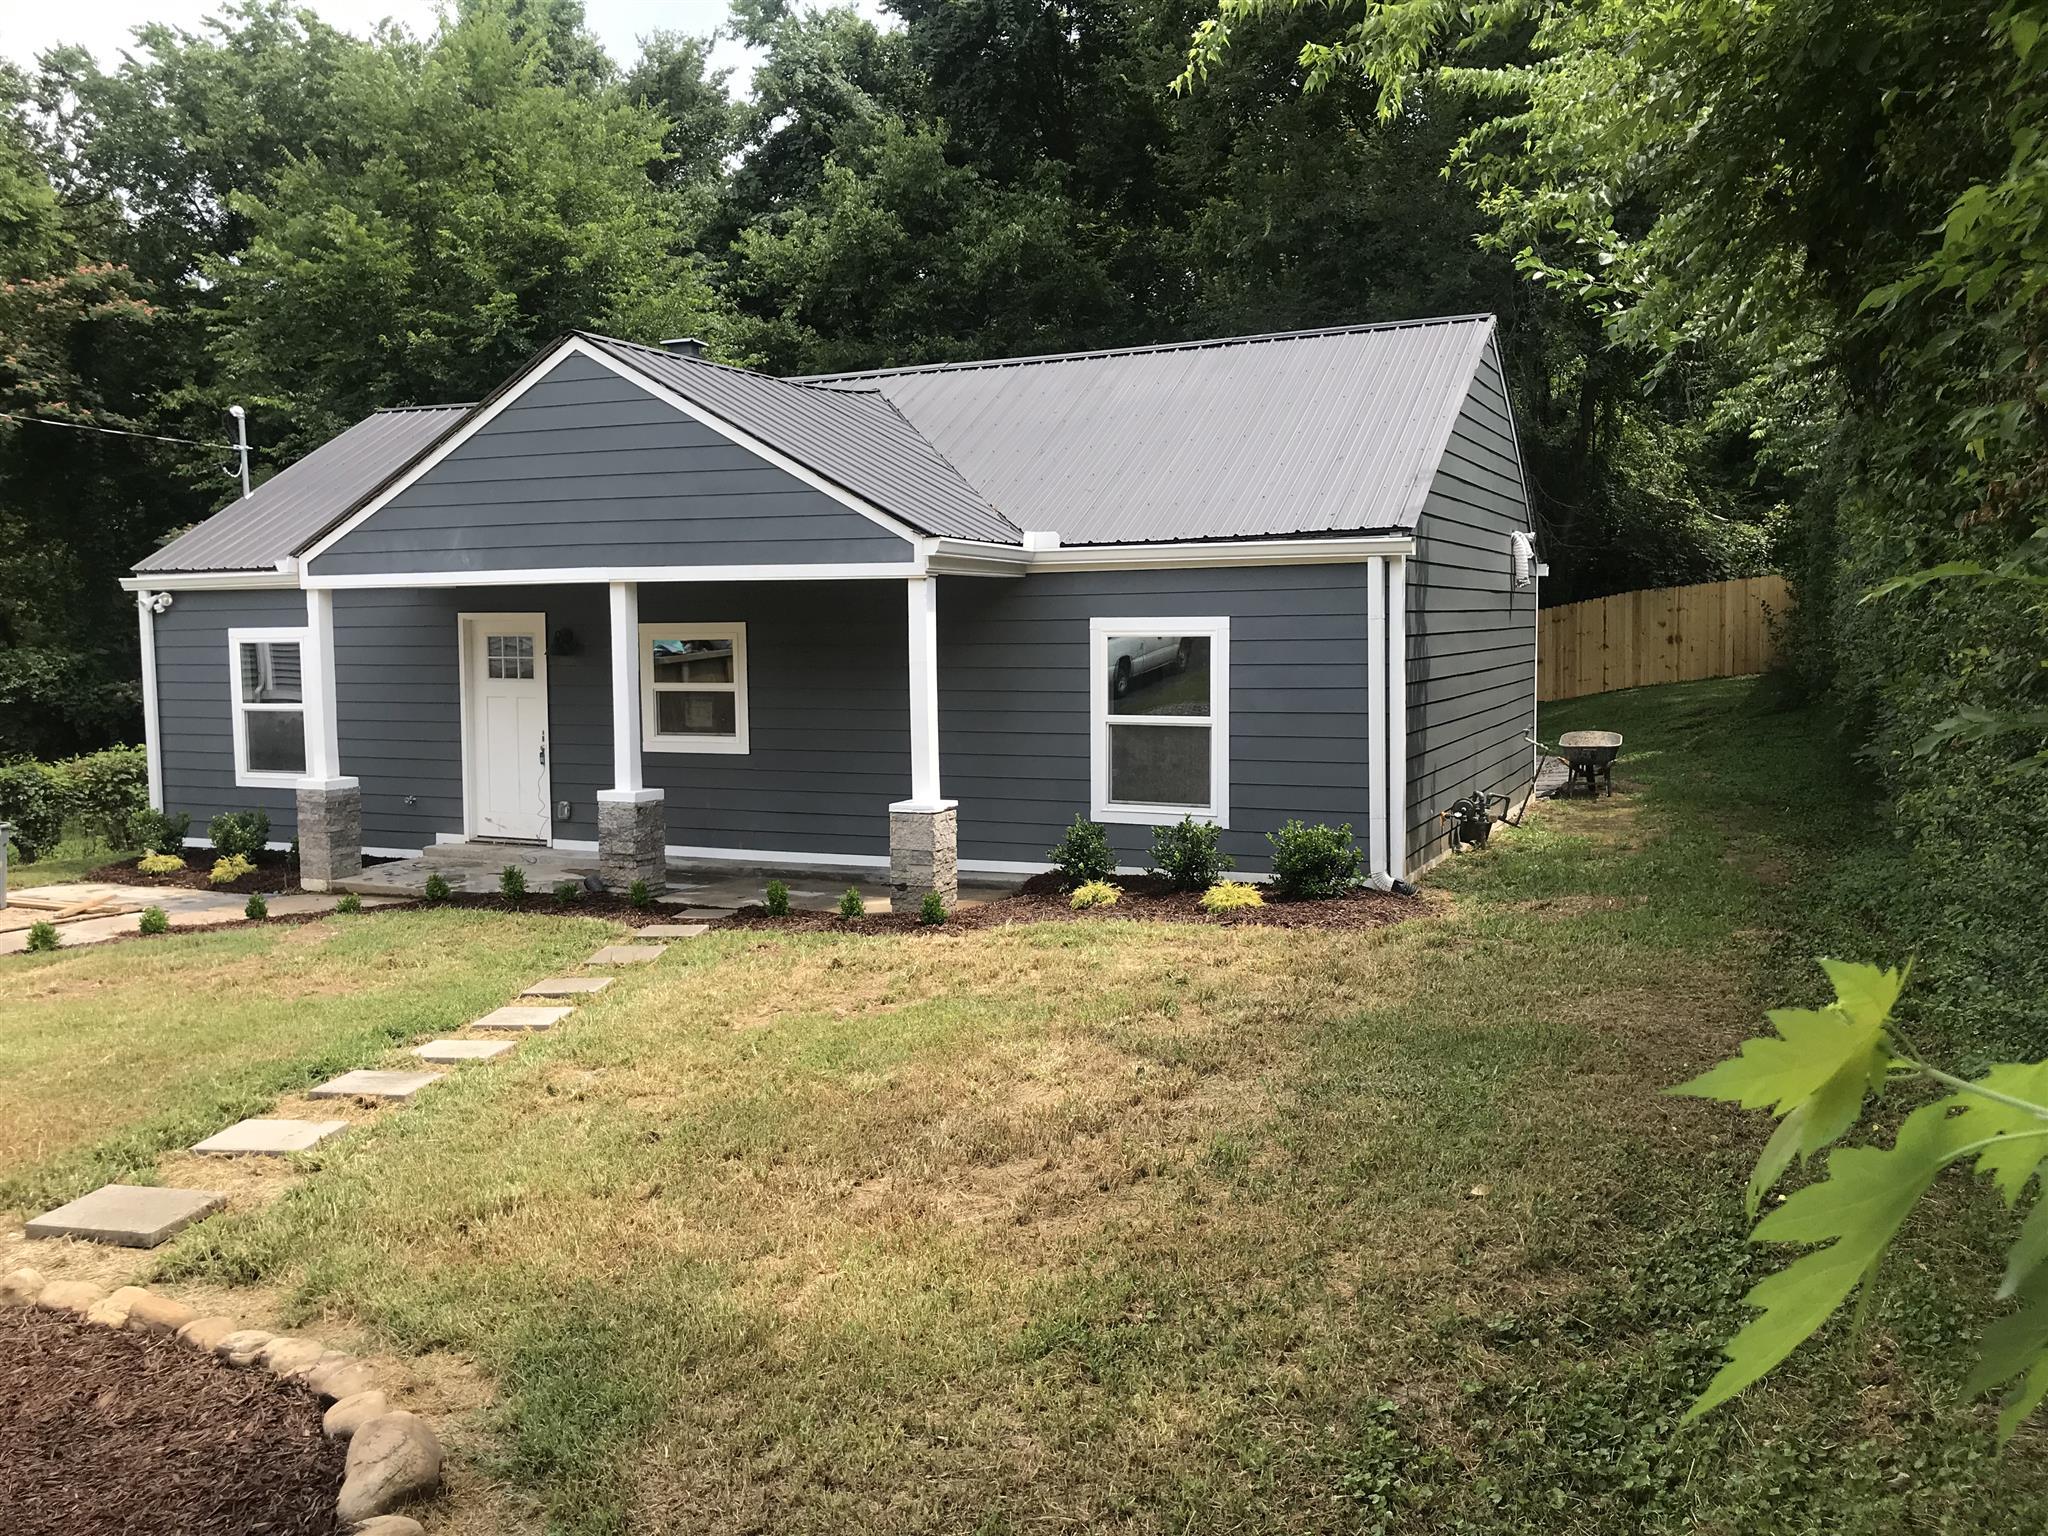 81 Lutie St, Nashville, TN 37210 - Nashville, TN real estate listing